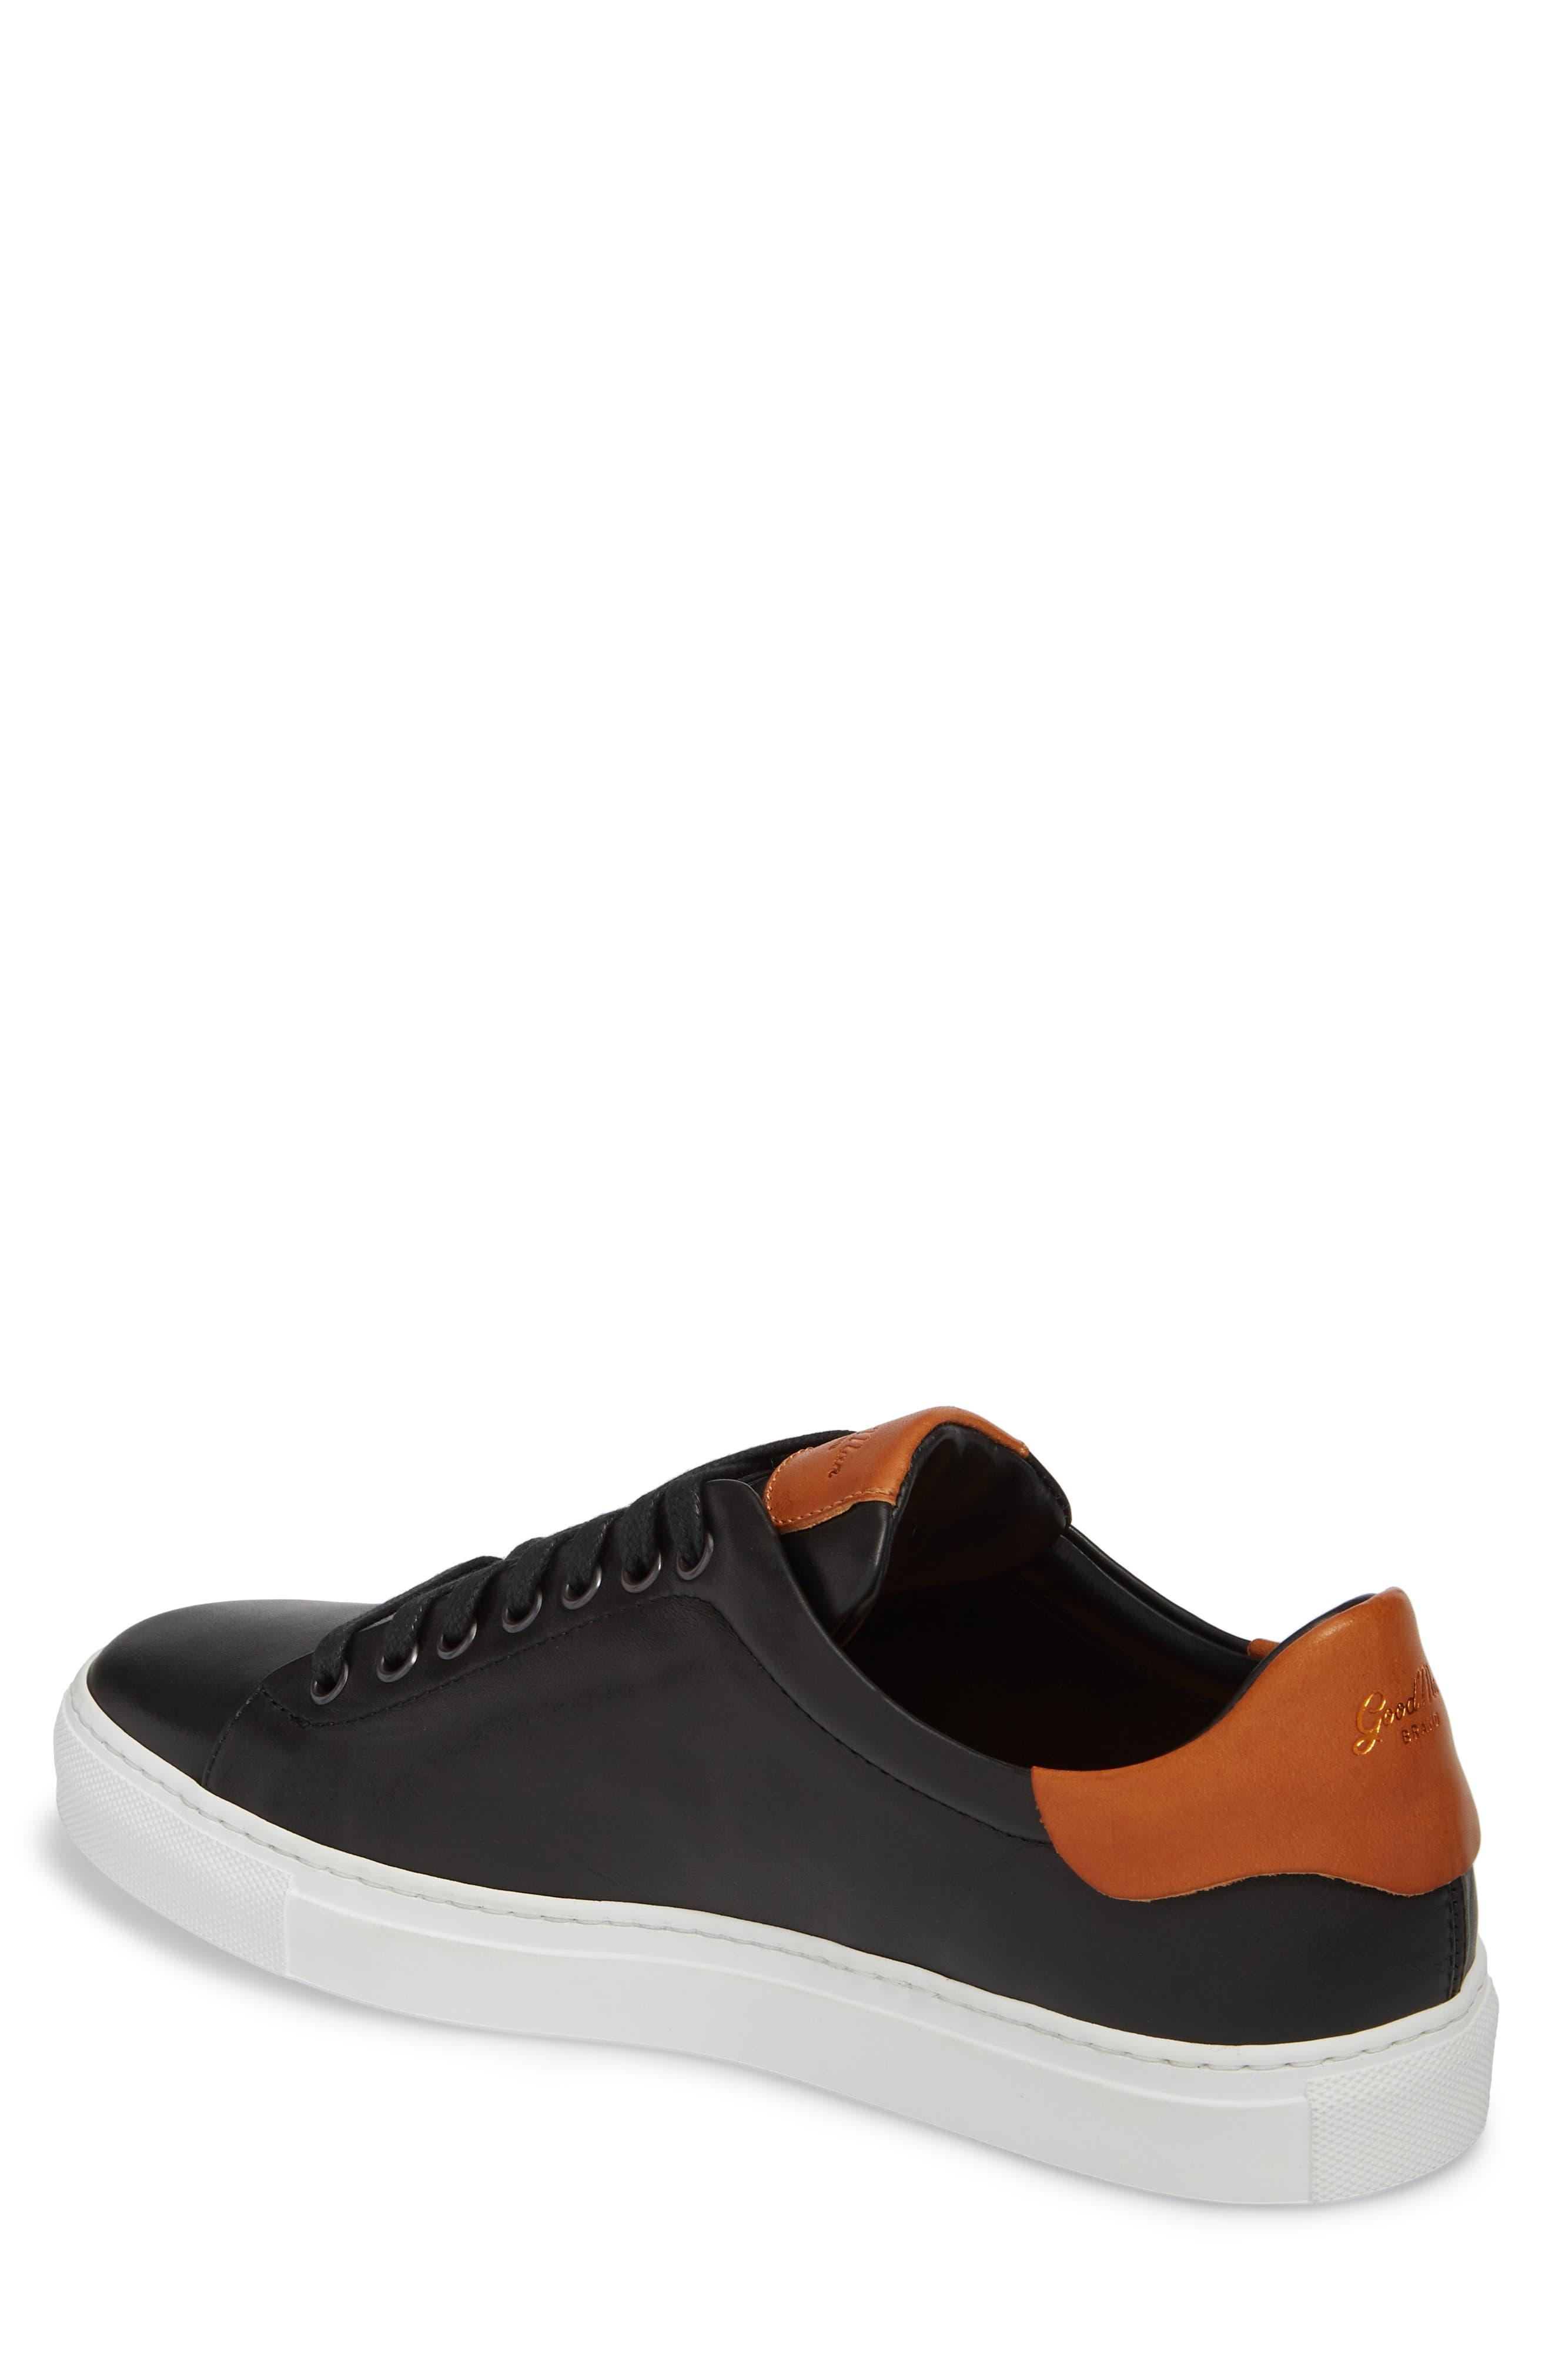 Legend Low Top Sneaker,                             Alternate thumbnail 2, color,                             BLACK/ VACHETTA LEATHER